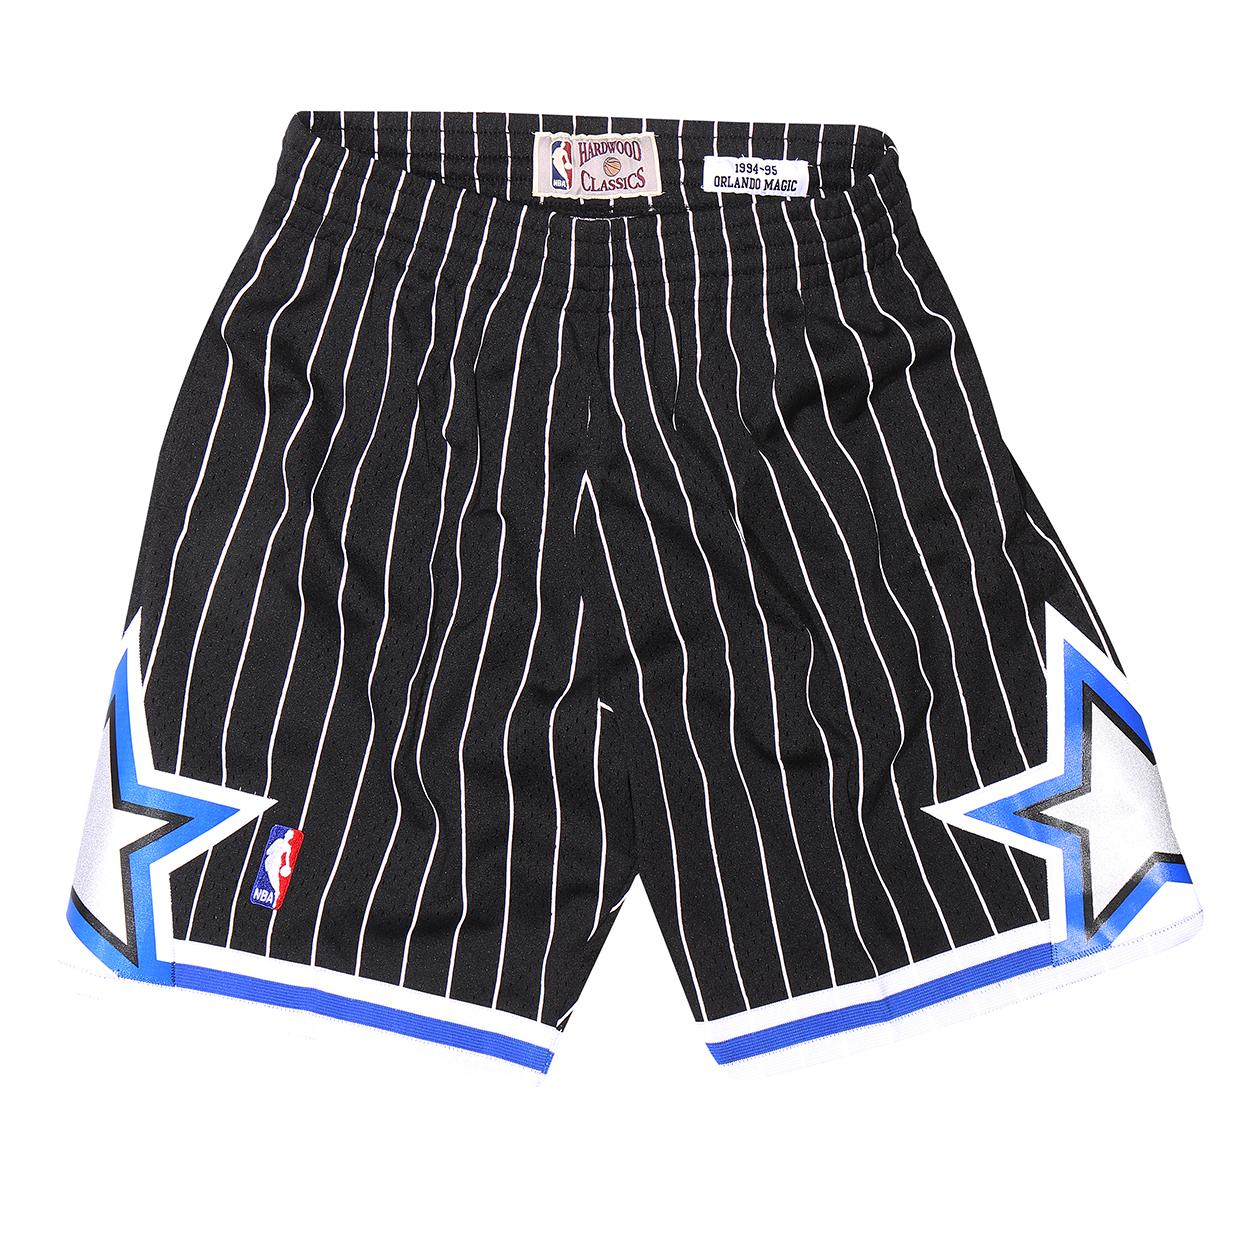 5425b7e4b2a6 1994-95 Alternate Swingman Shorts Orlando Magic